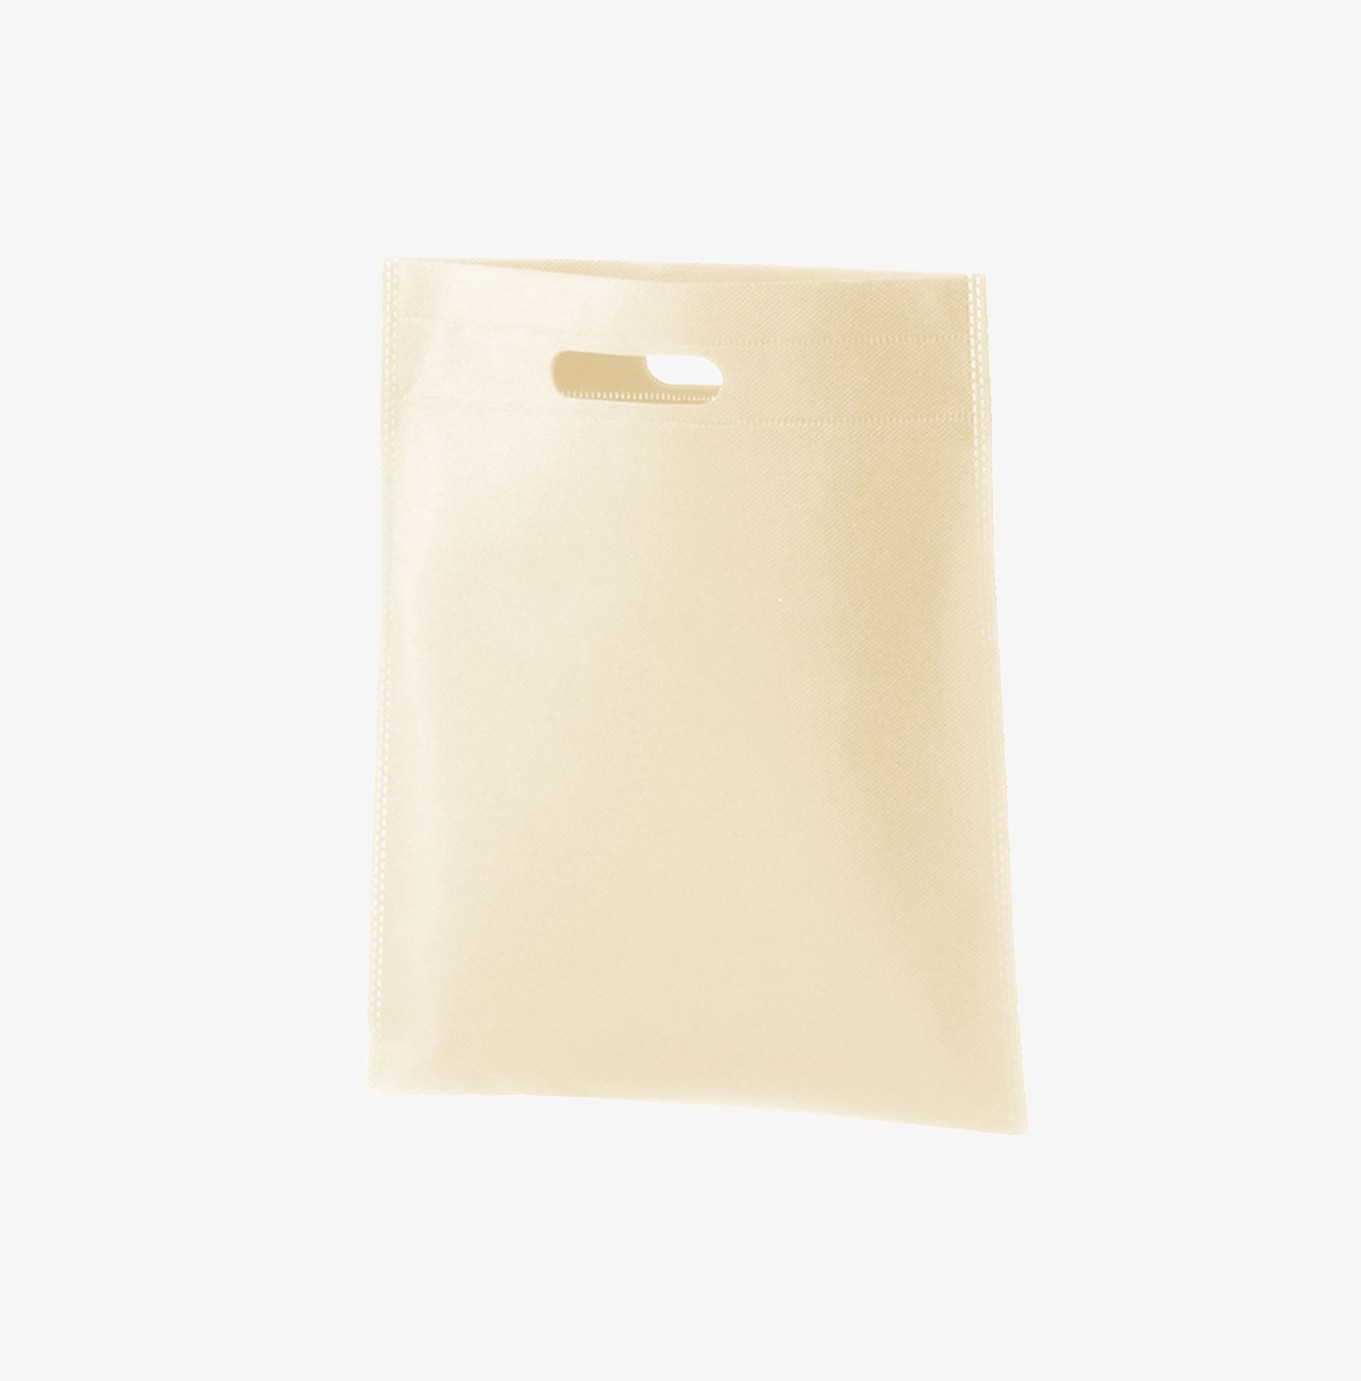 PKD30x40MB 米白色平口袋 30x40cm 200个